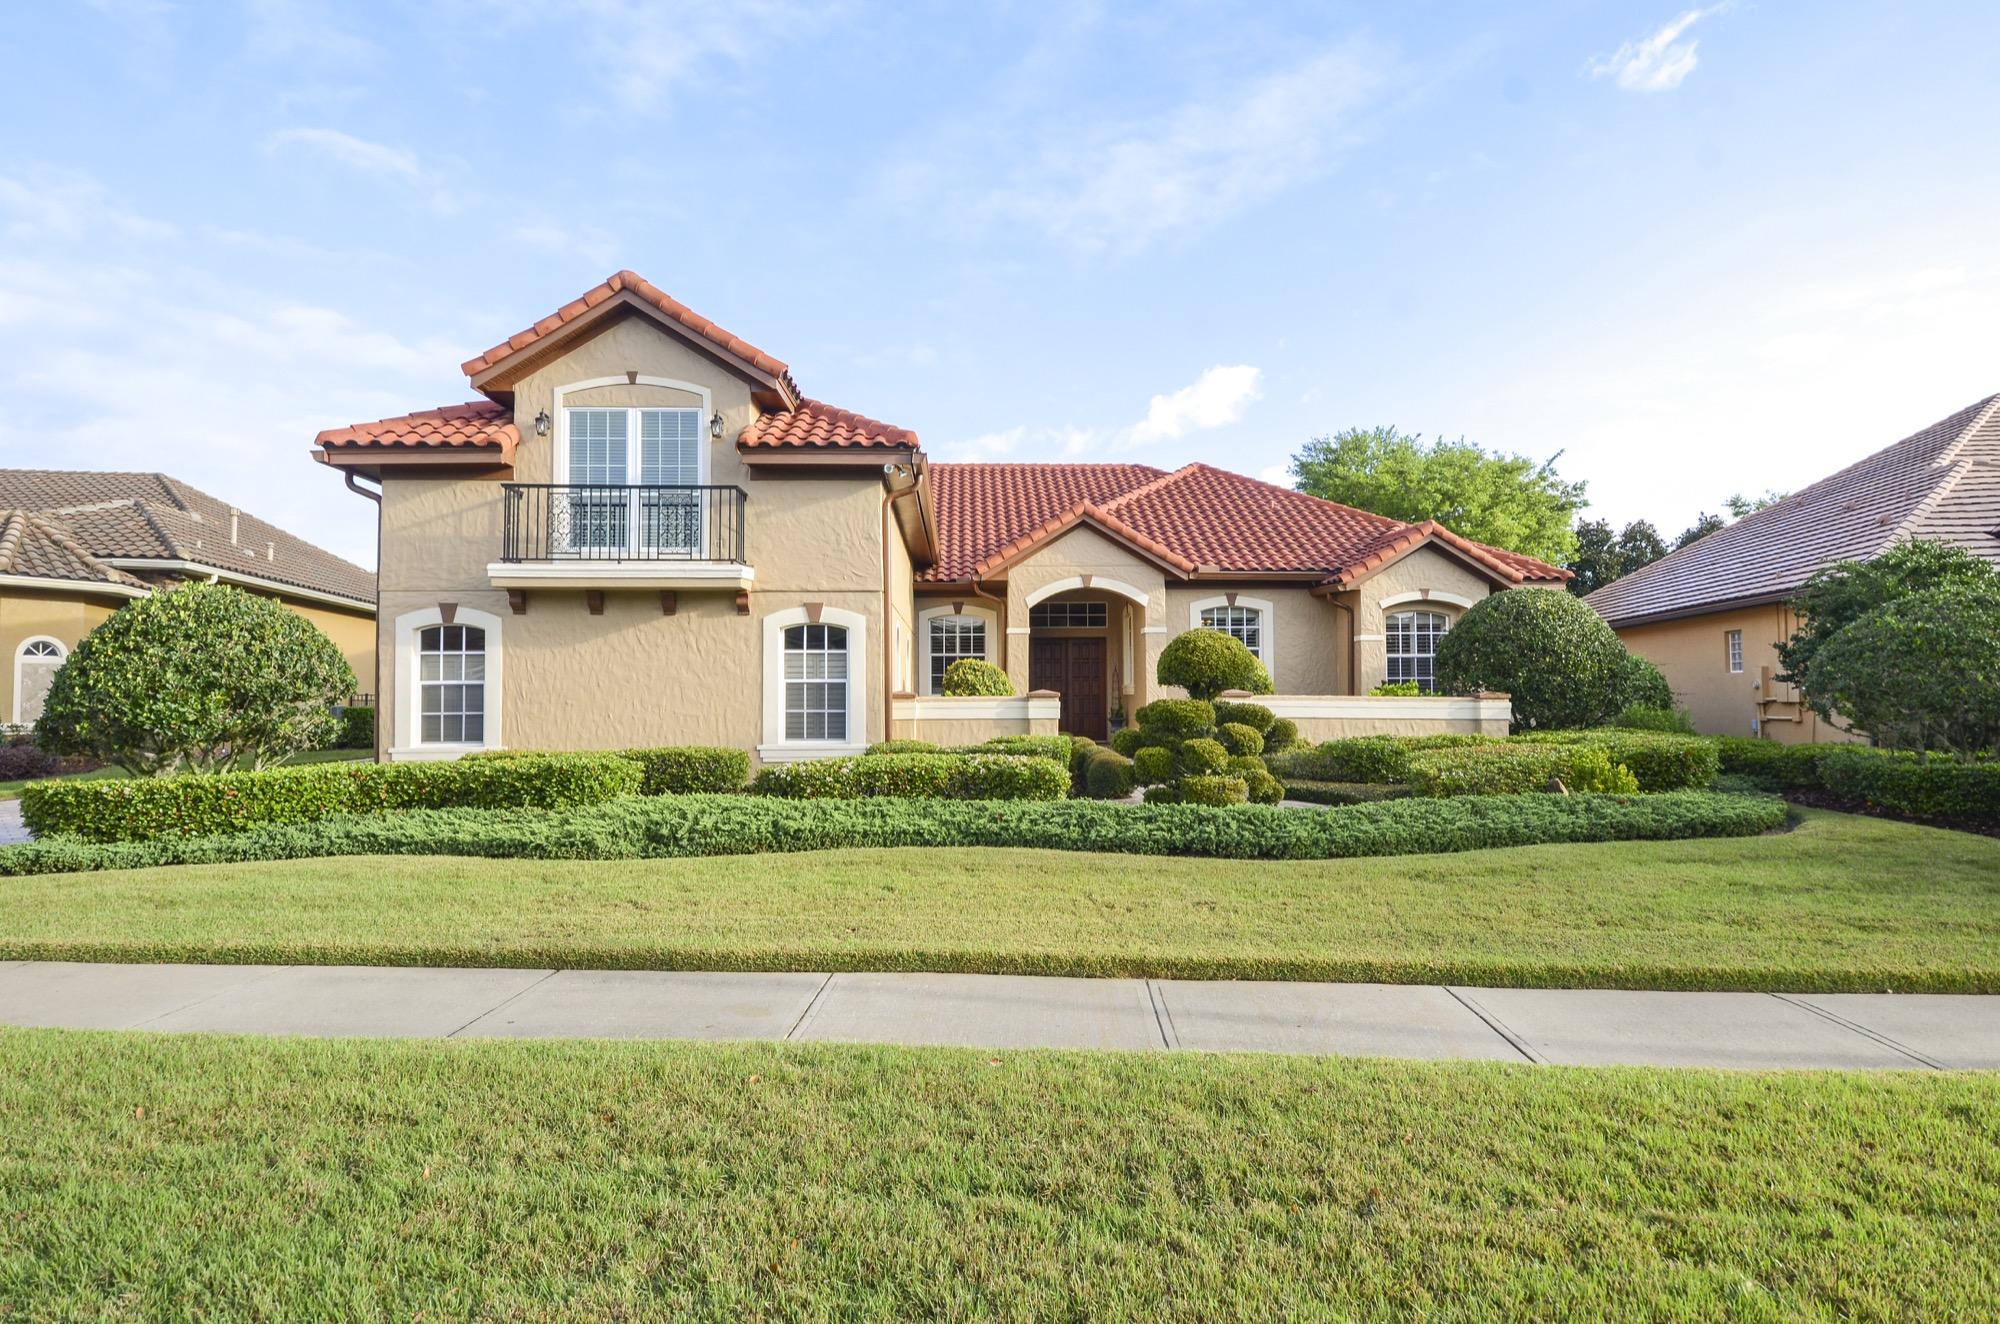 8811 Cypress Reserve Cir, Orlando, FL 32836